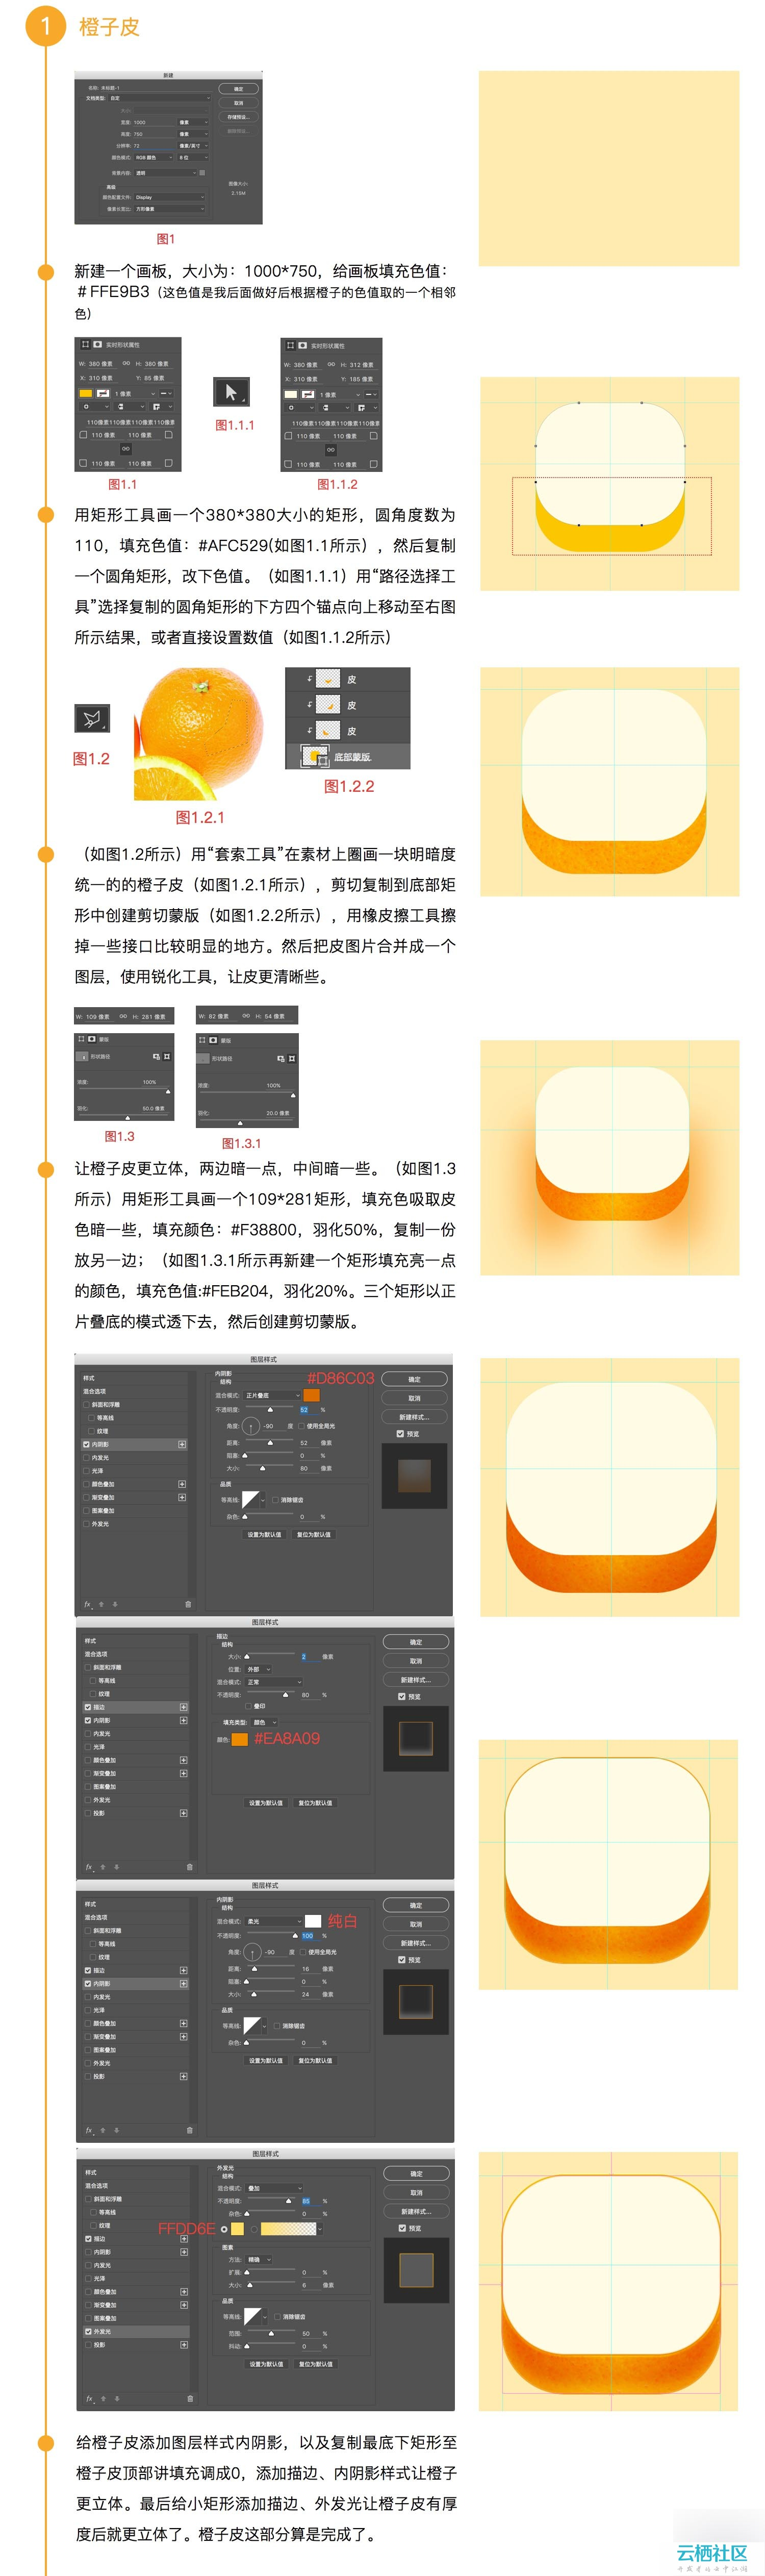 PS鼠绘有创意逼真的橙子APP图标-过于逼真不宜展示图标